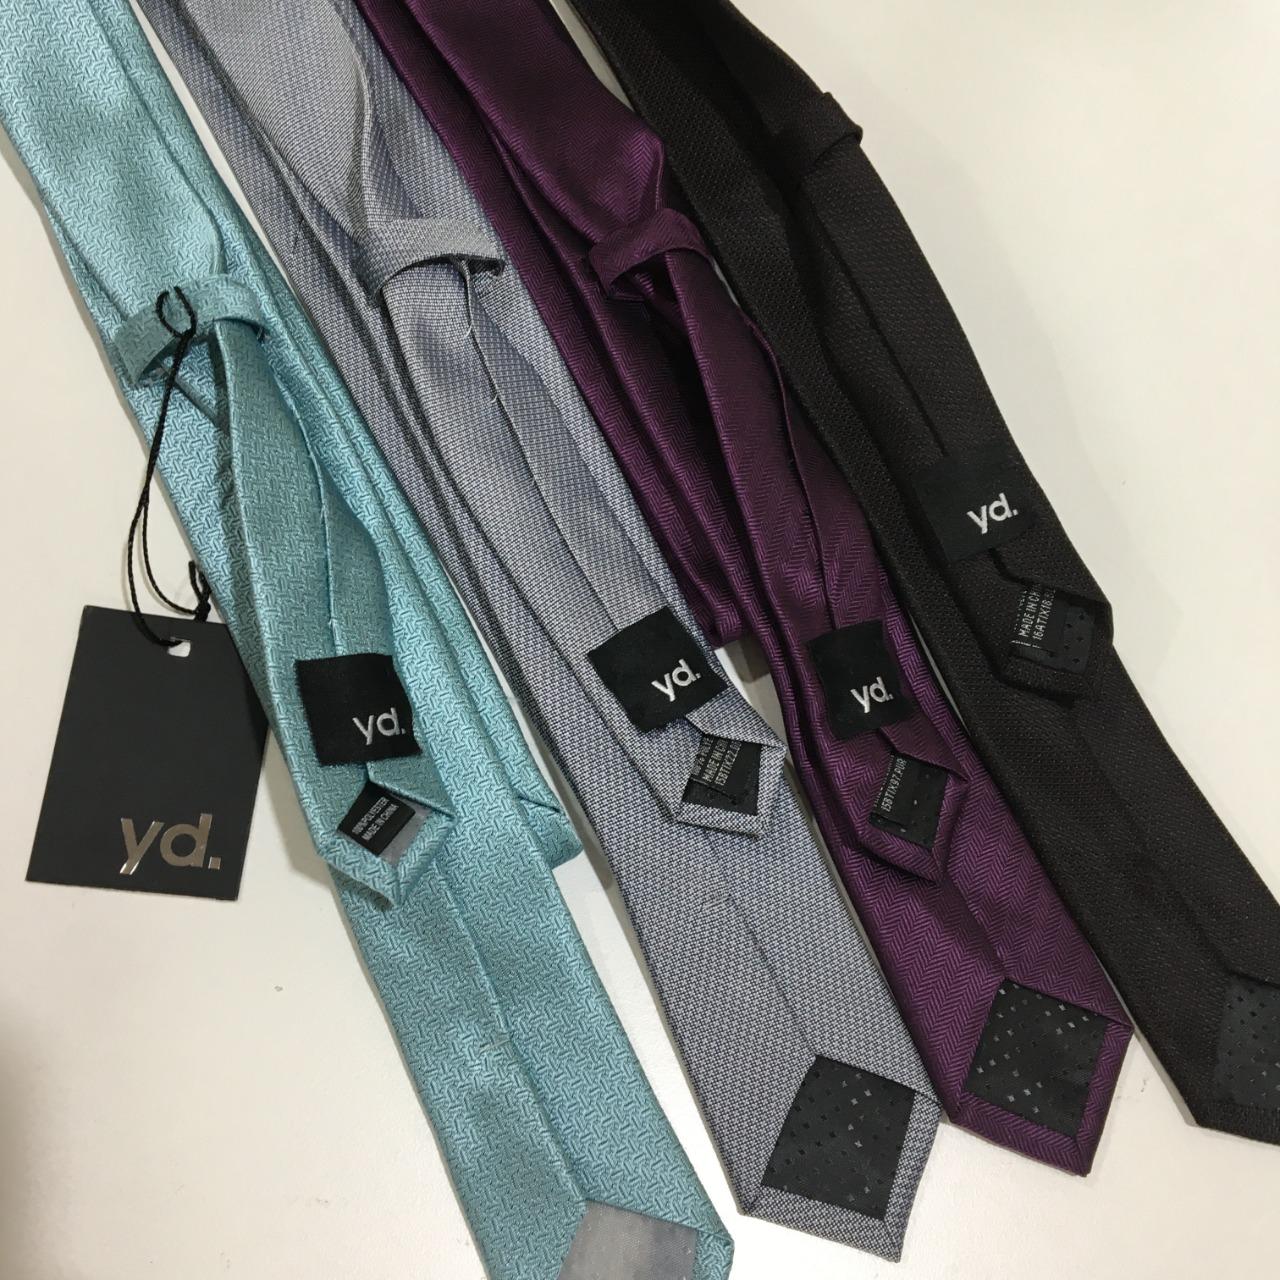 CLEARANCE - Yd. Men's Ties x 4, Black, Purple, Silver Grey, Aqua